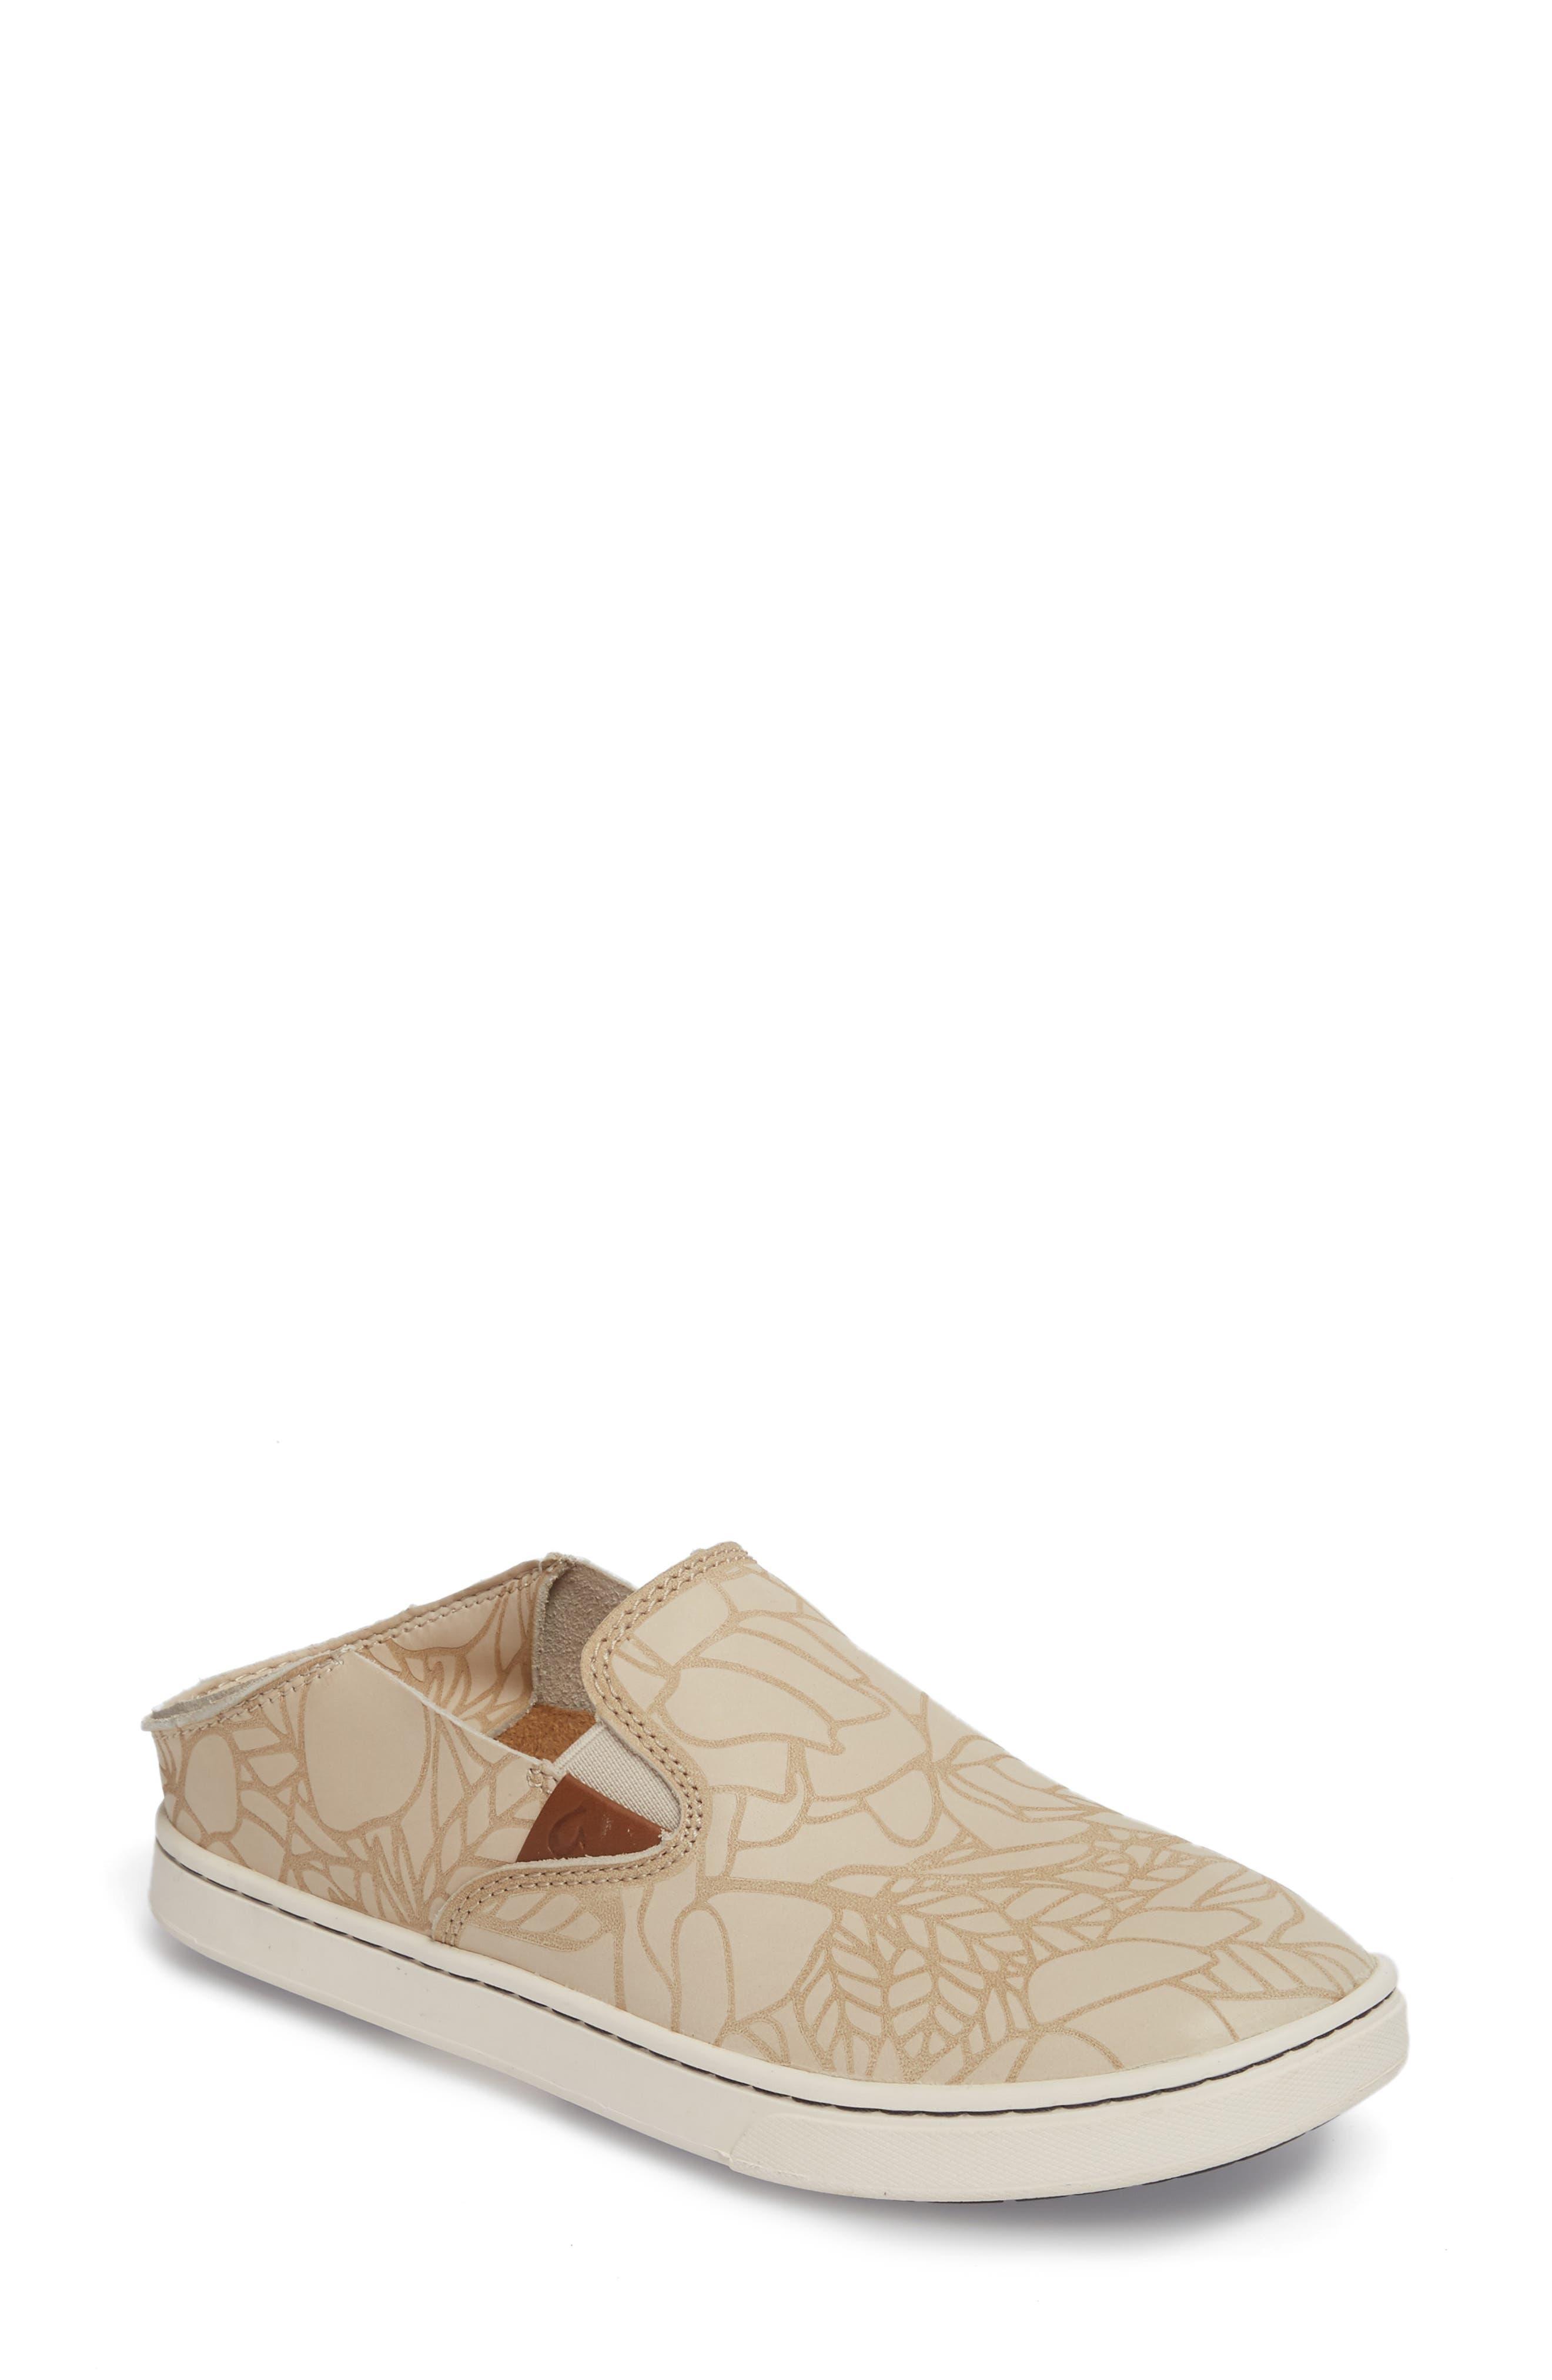 Pehuea Lau Slip-On Sneaker,                             Main thumbnail 1, color,                             TAPA/ TAPA FABRIC